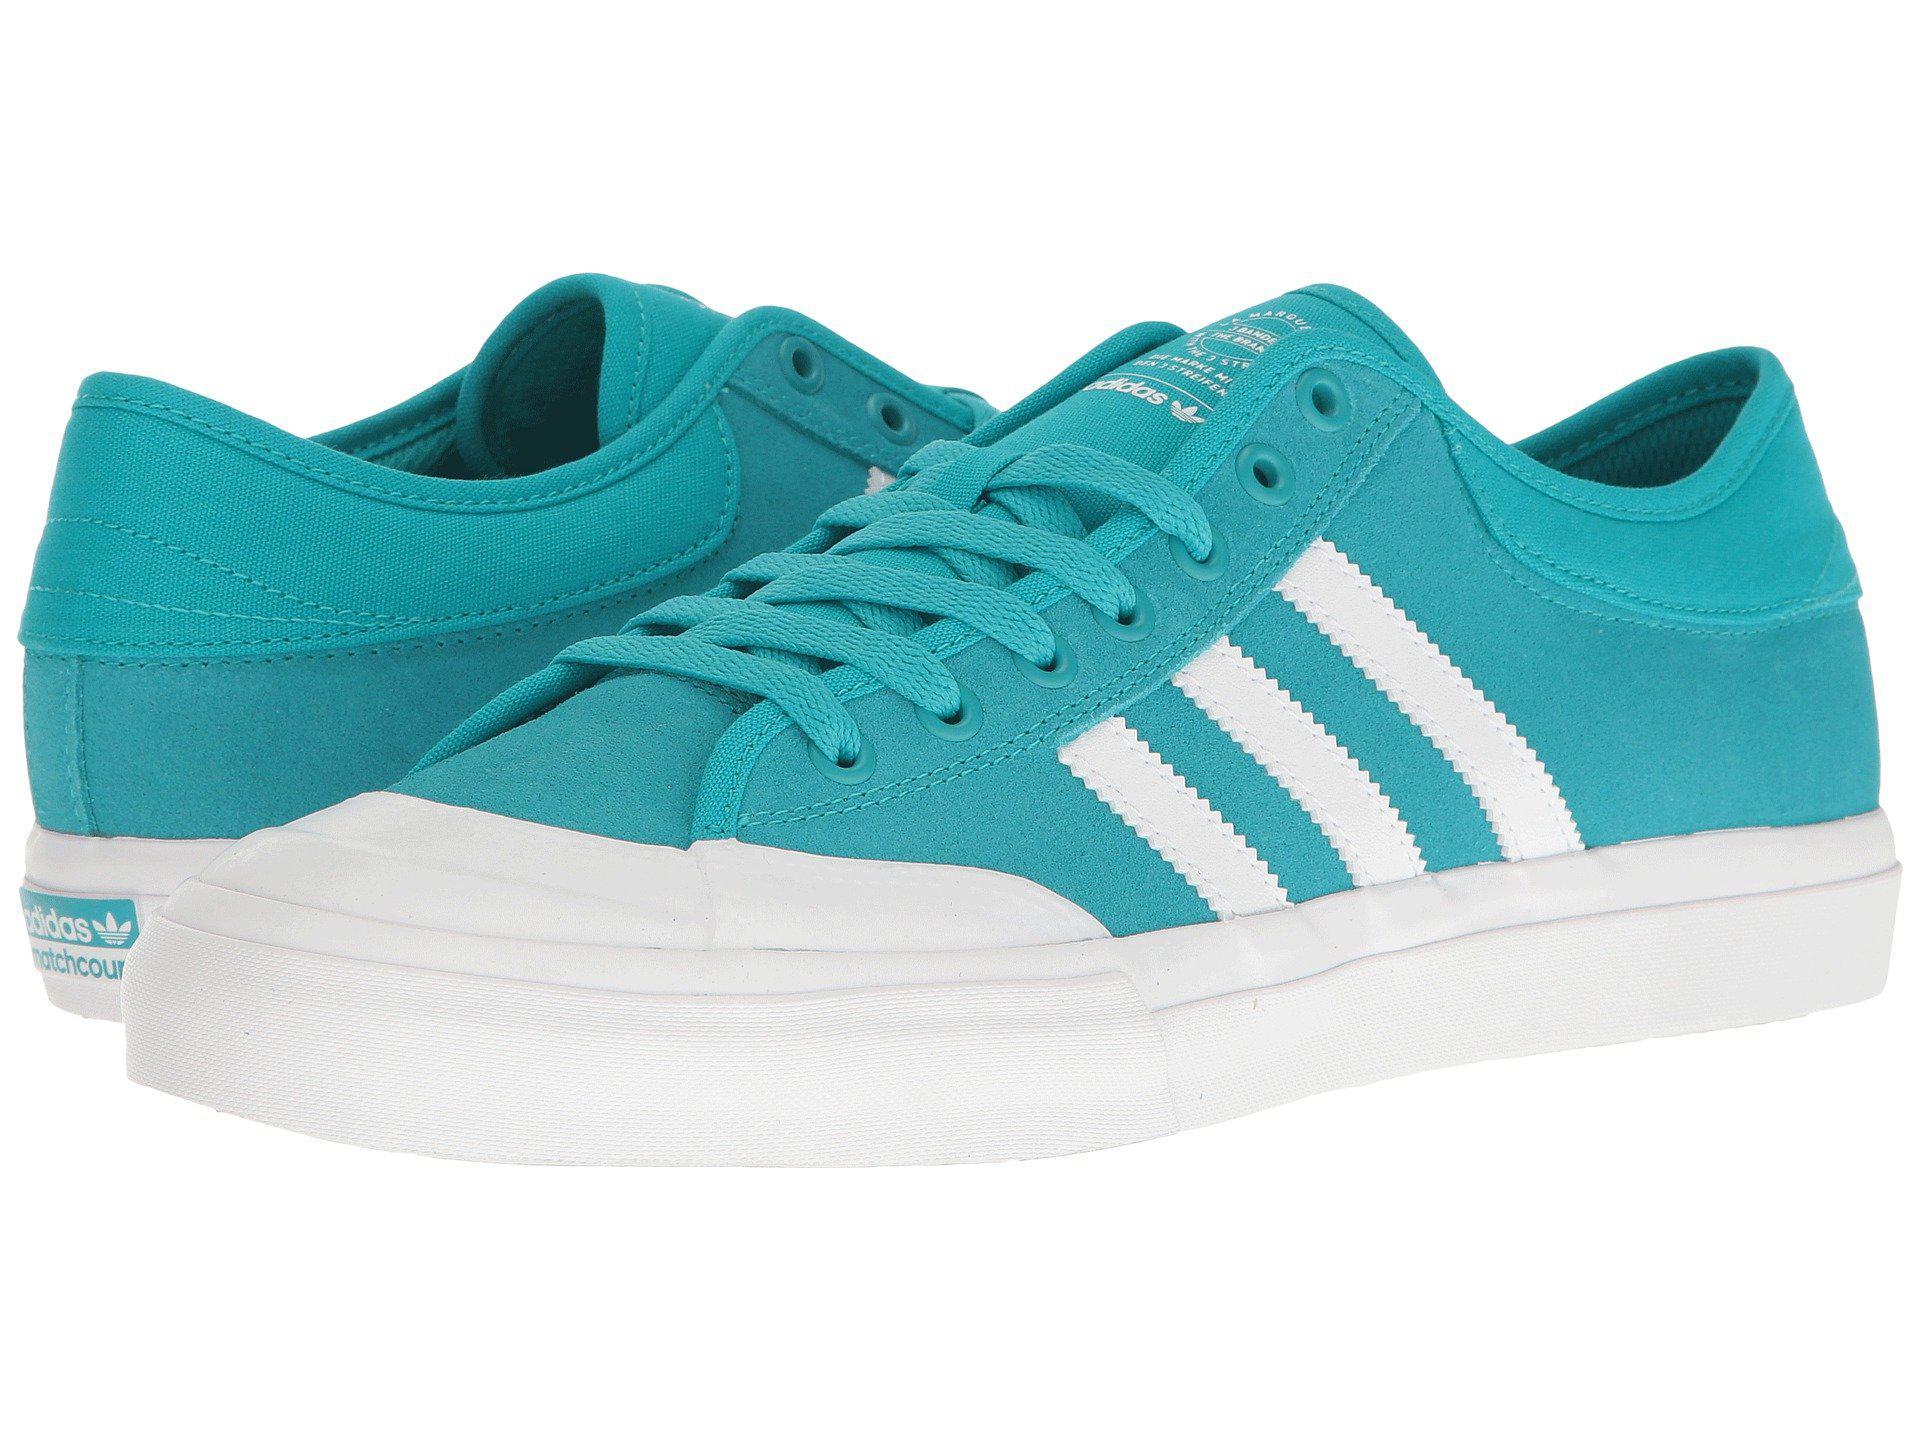 newest 73903 7a1ac Lyst - adidas Originals Matchcourt in Blue for Men